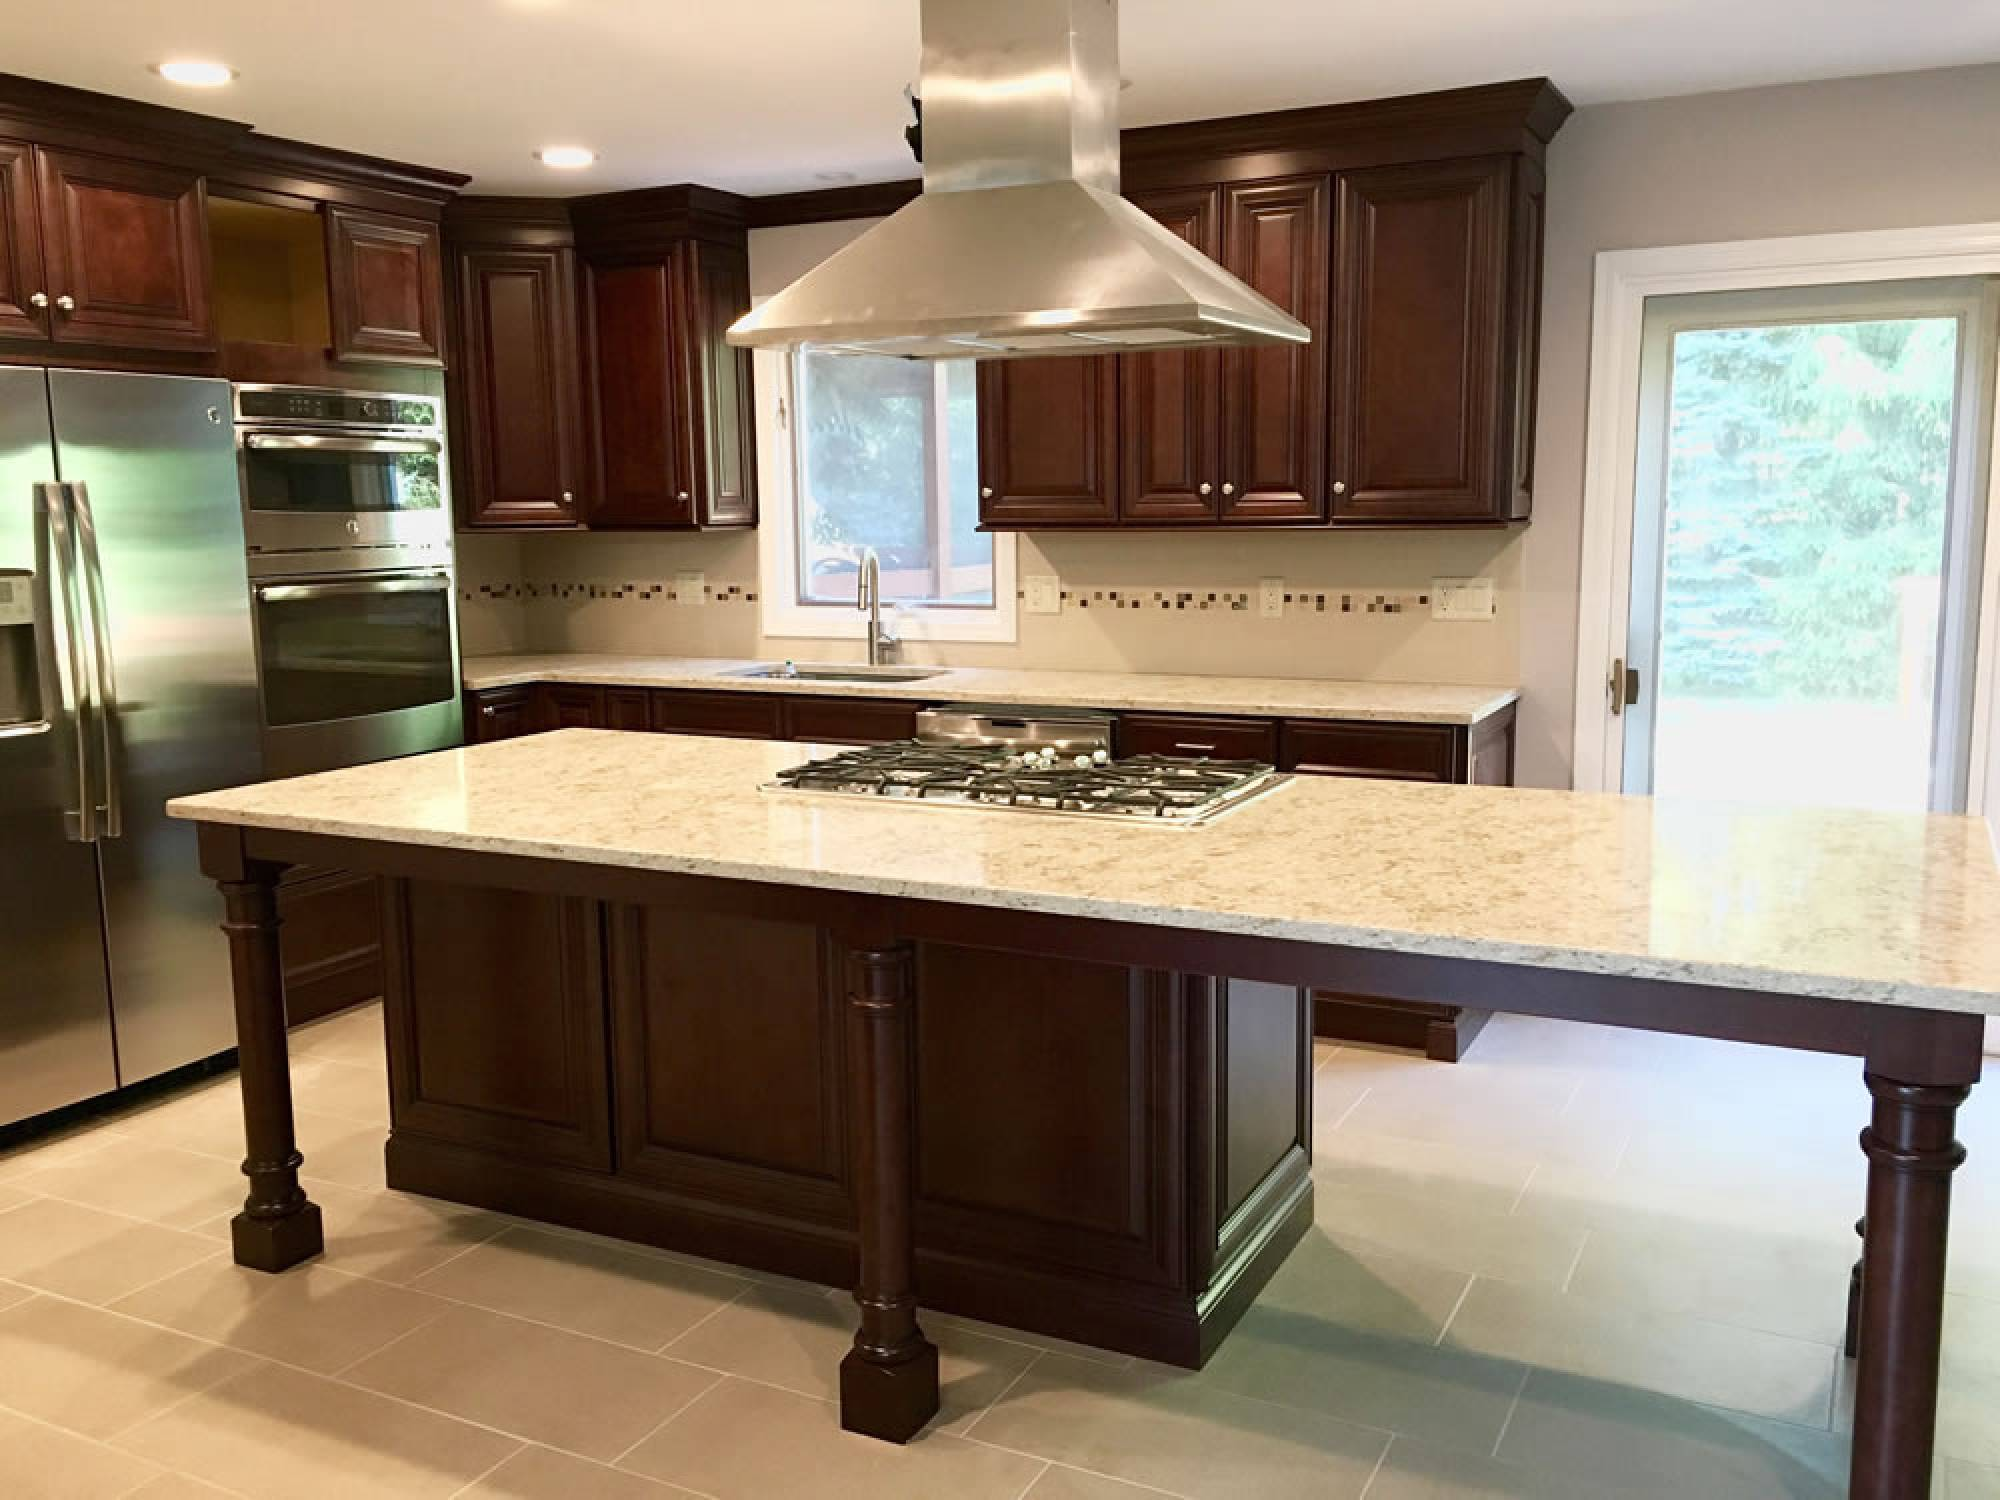 magnolia home remodeling group union new jersey nj. Black Bedroom Furniture Sets. Home Design Ideas